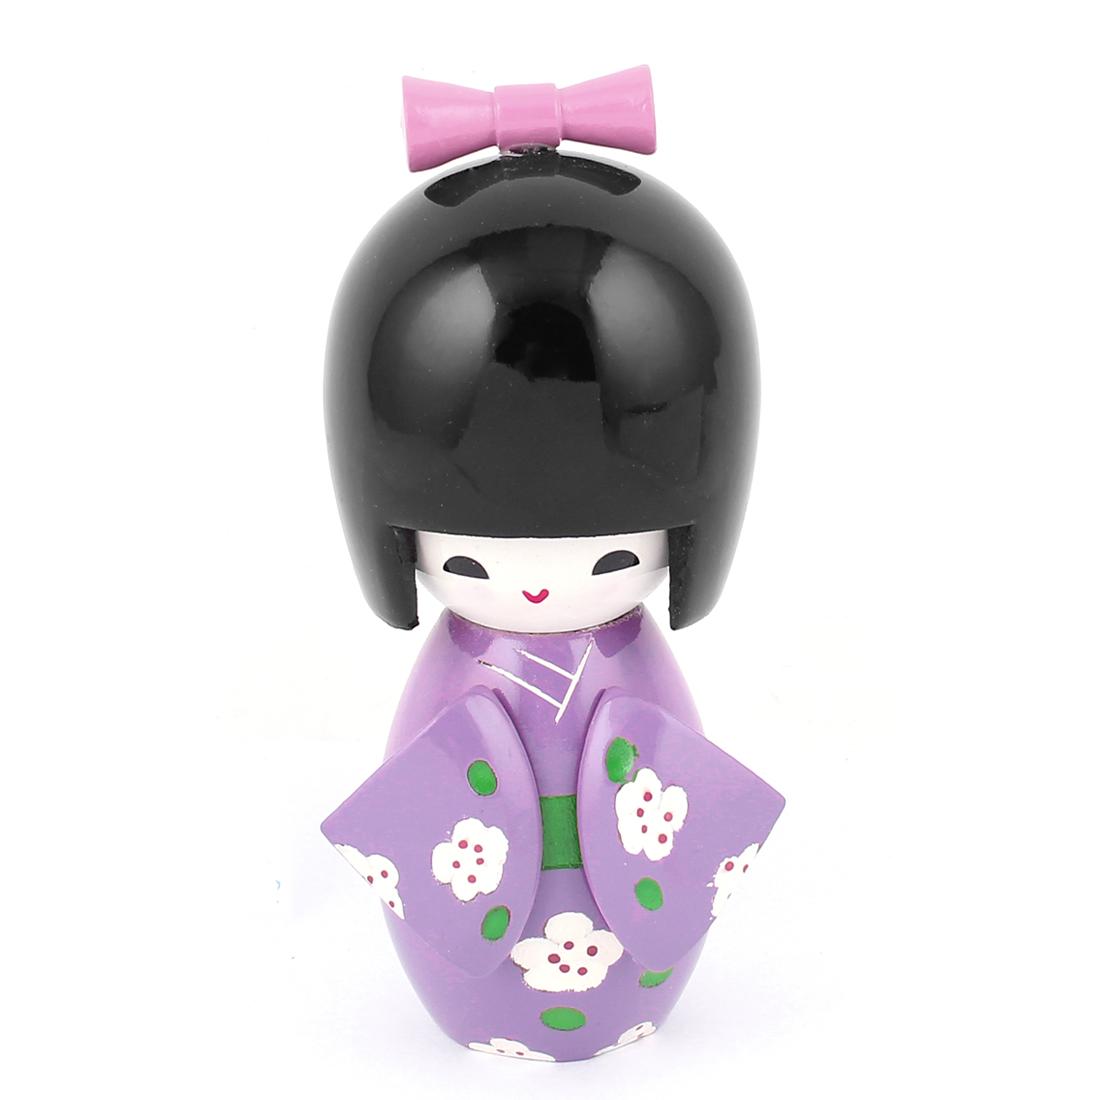 Manual Floral Decor Kimono Wooden Craft Gift Japanese Kokeshi Doll Purple